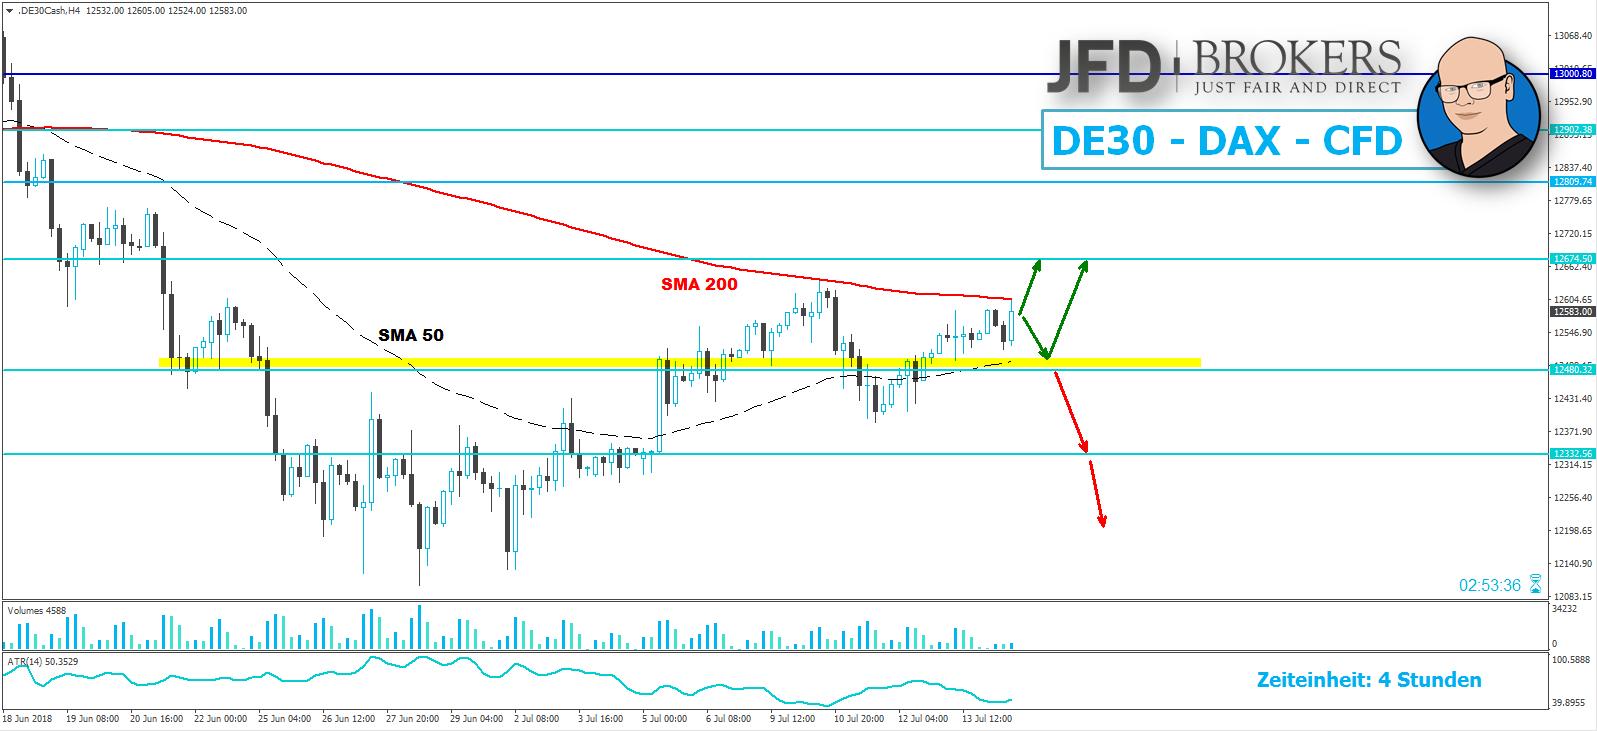 JFD-Wochenausblick-EUR-USD-GBP-USD-DAX-und-WTI-16-07-2018-20-07-2018-Kommentar-JFD-Brokers-GodmodeTrader.de-3